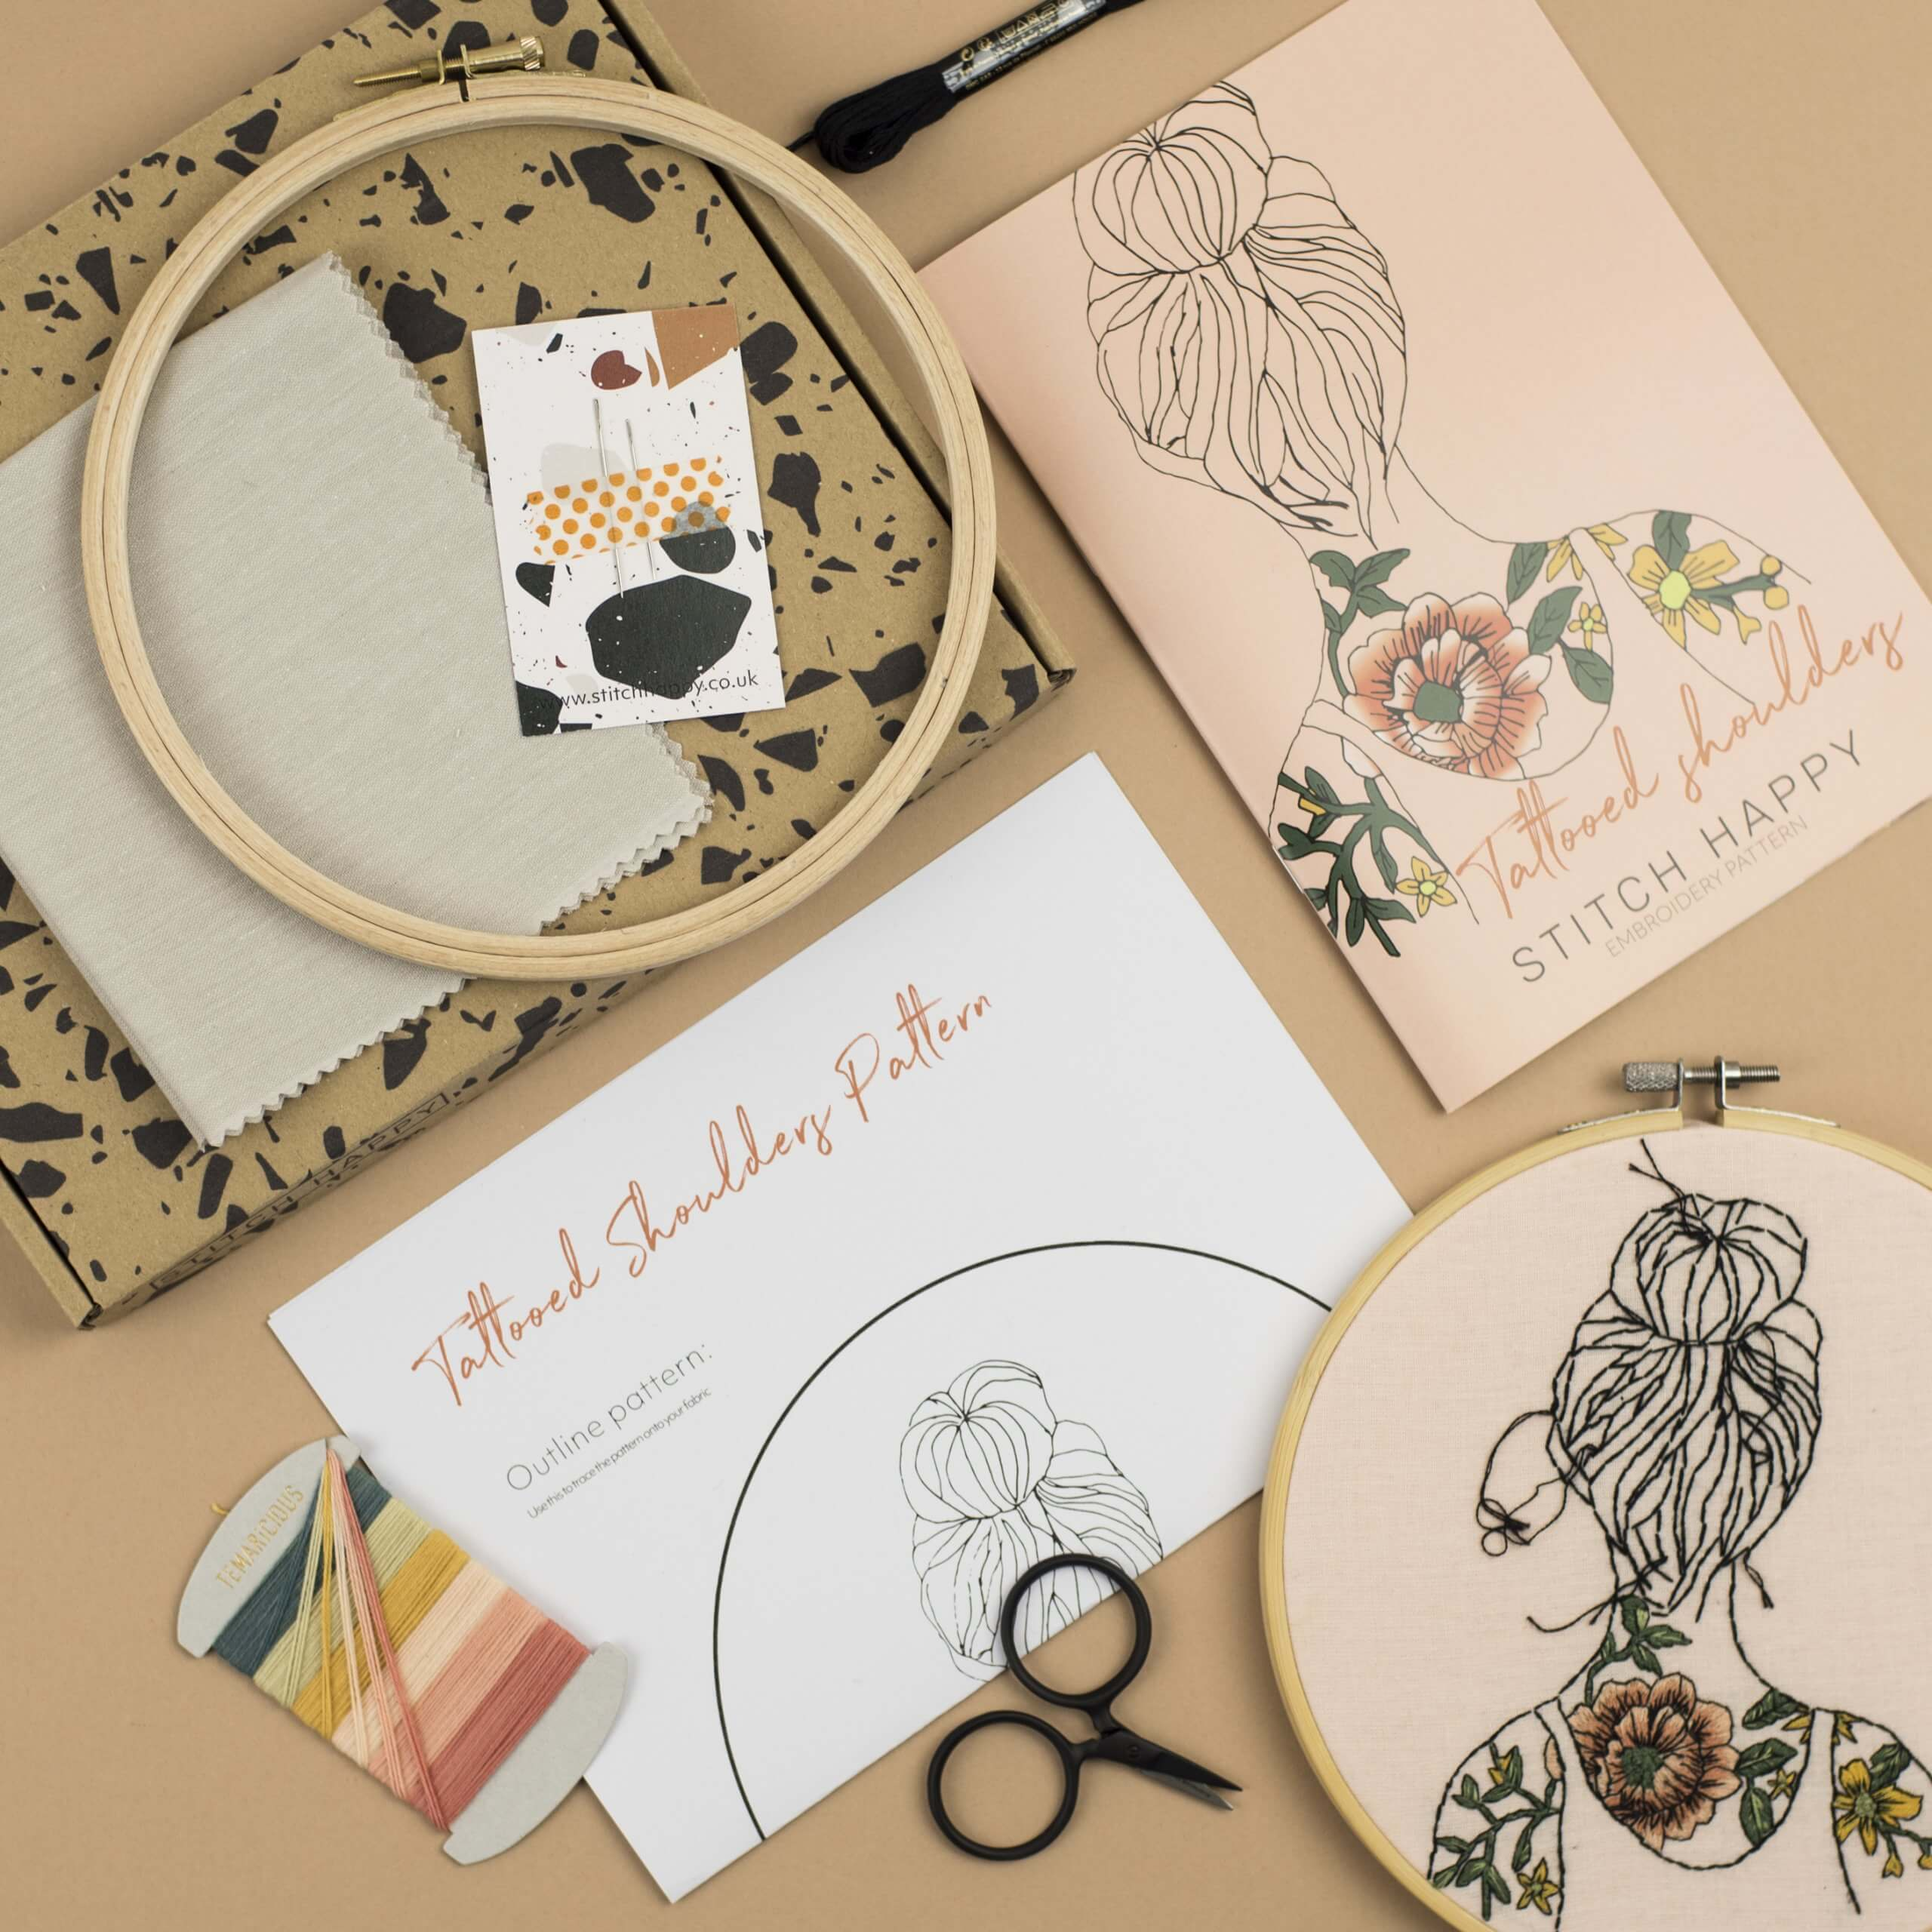 kit de costura de la marca Stitch Happy